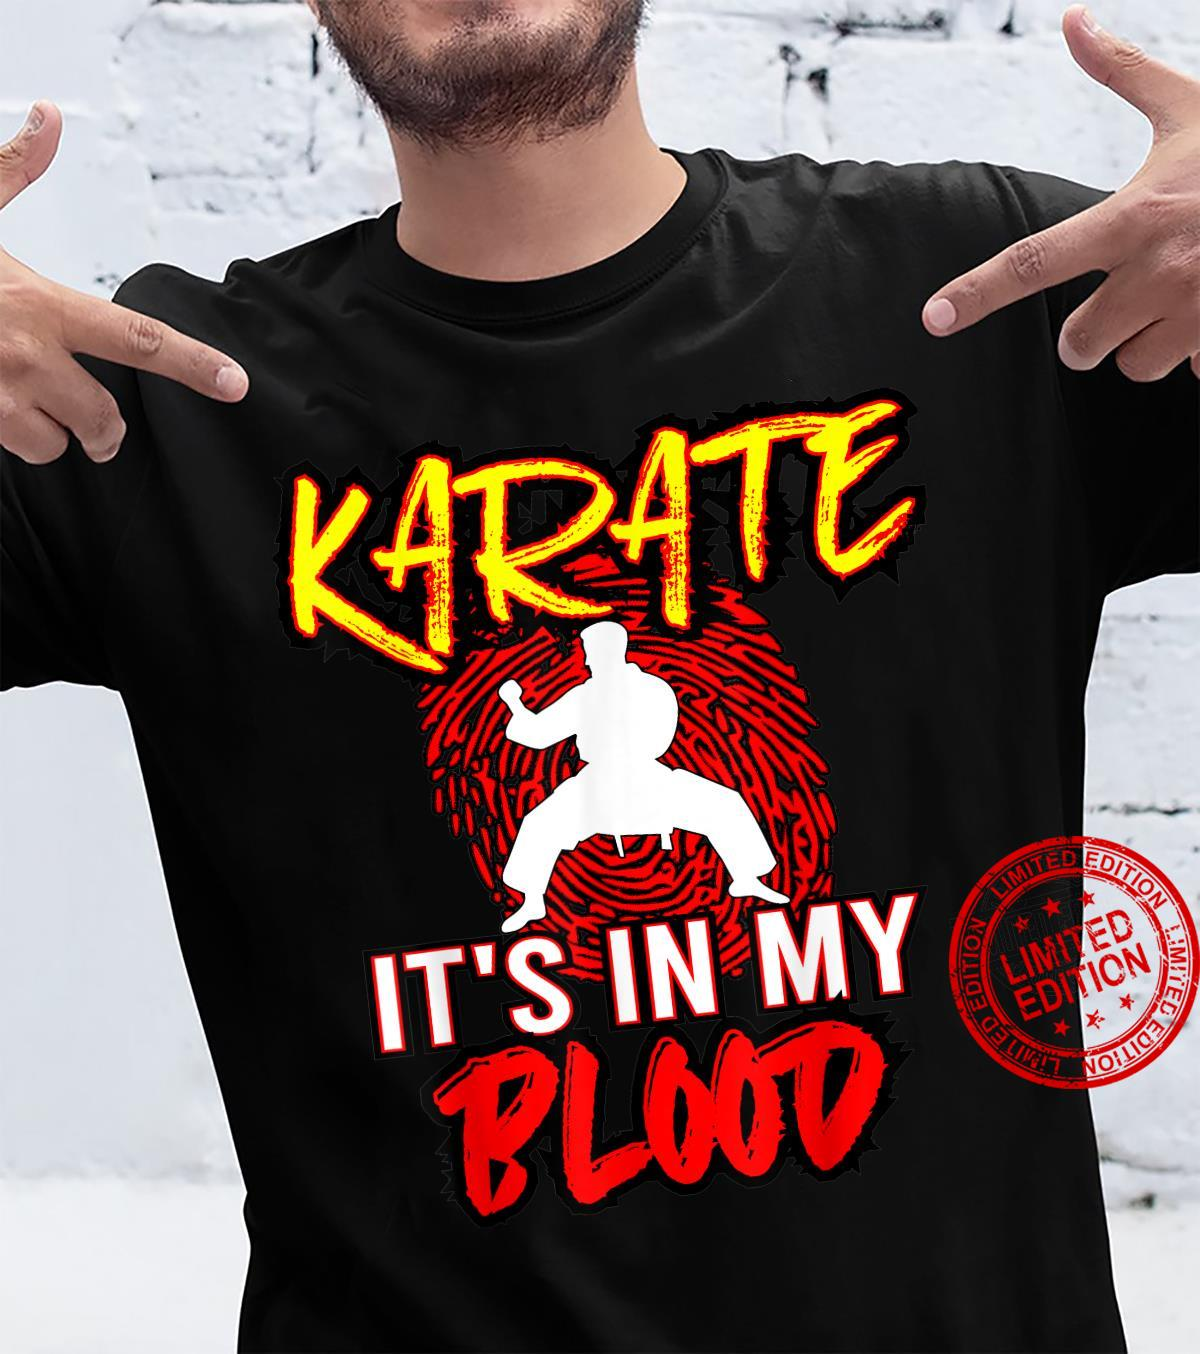 Karate Coach Mixed Martial Arts Sensei Instructor Student Shirt